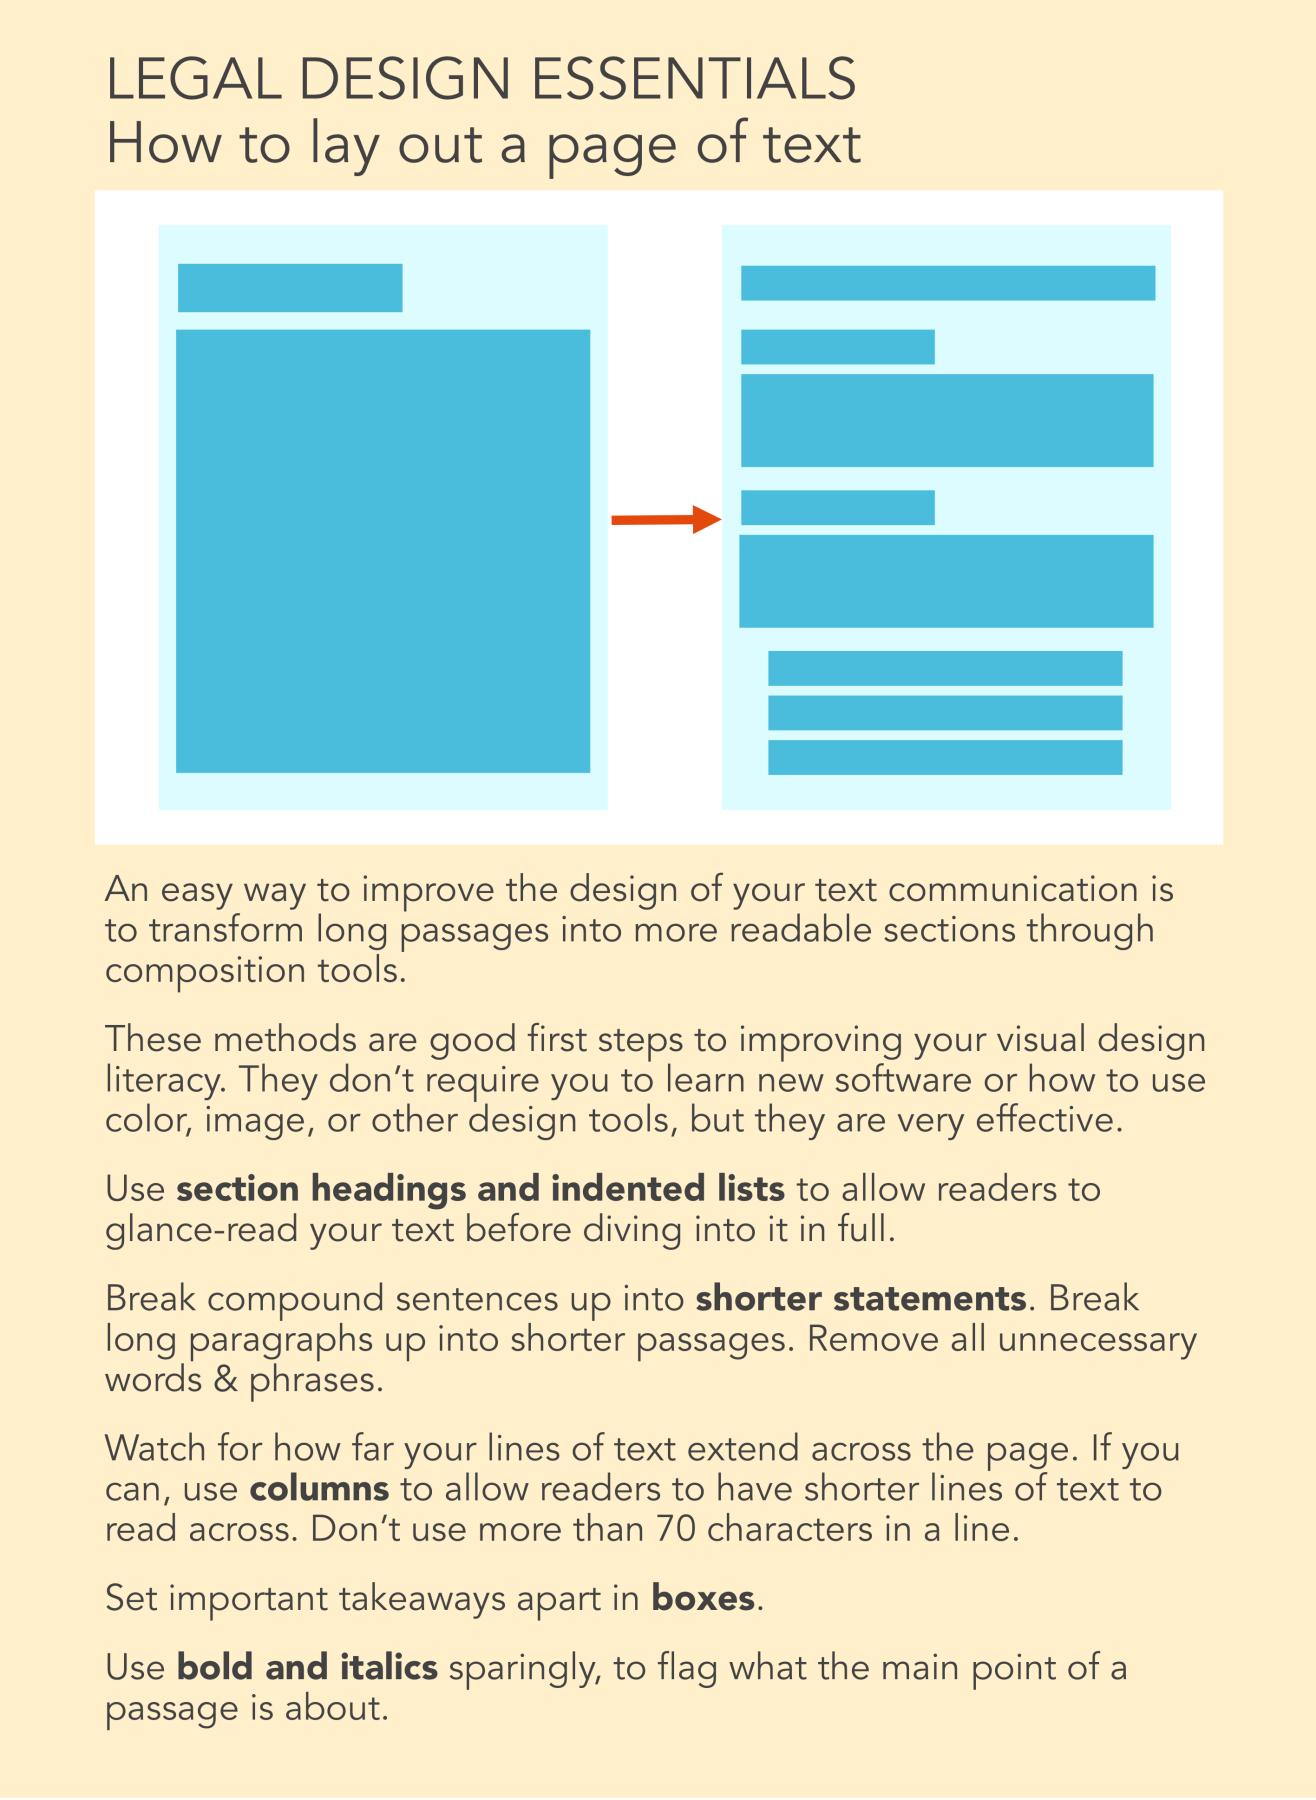 Legal Communication Design Toolbox | Legal Design Toolbox